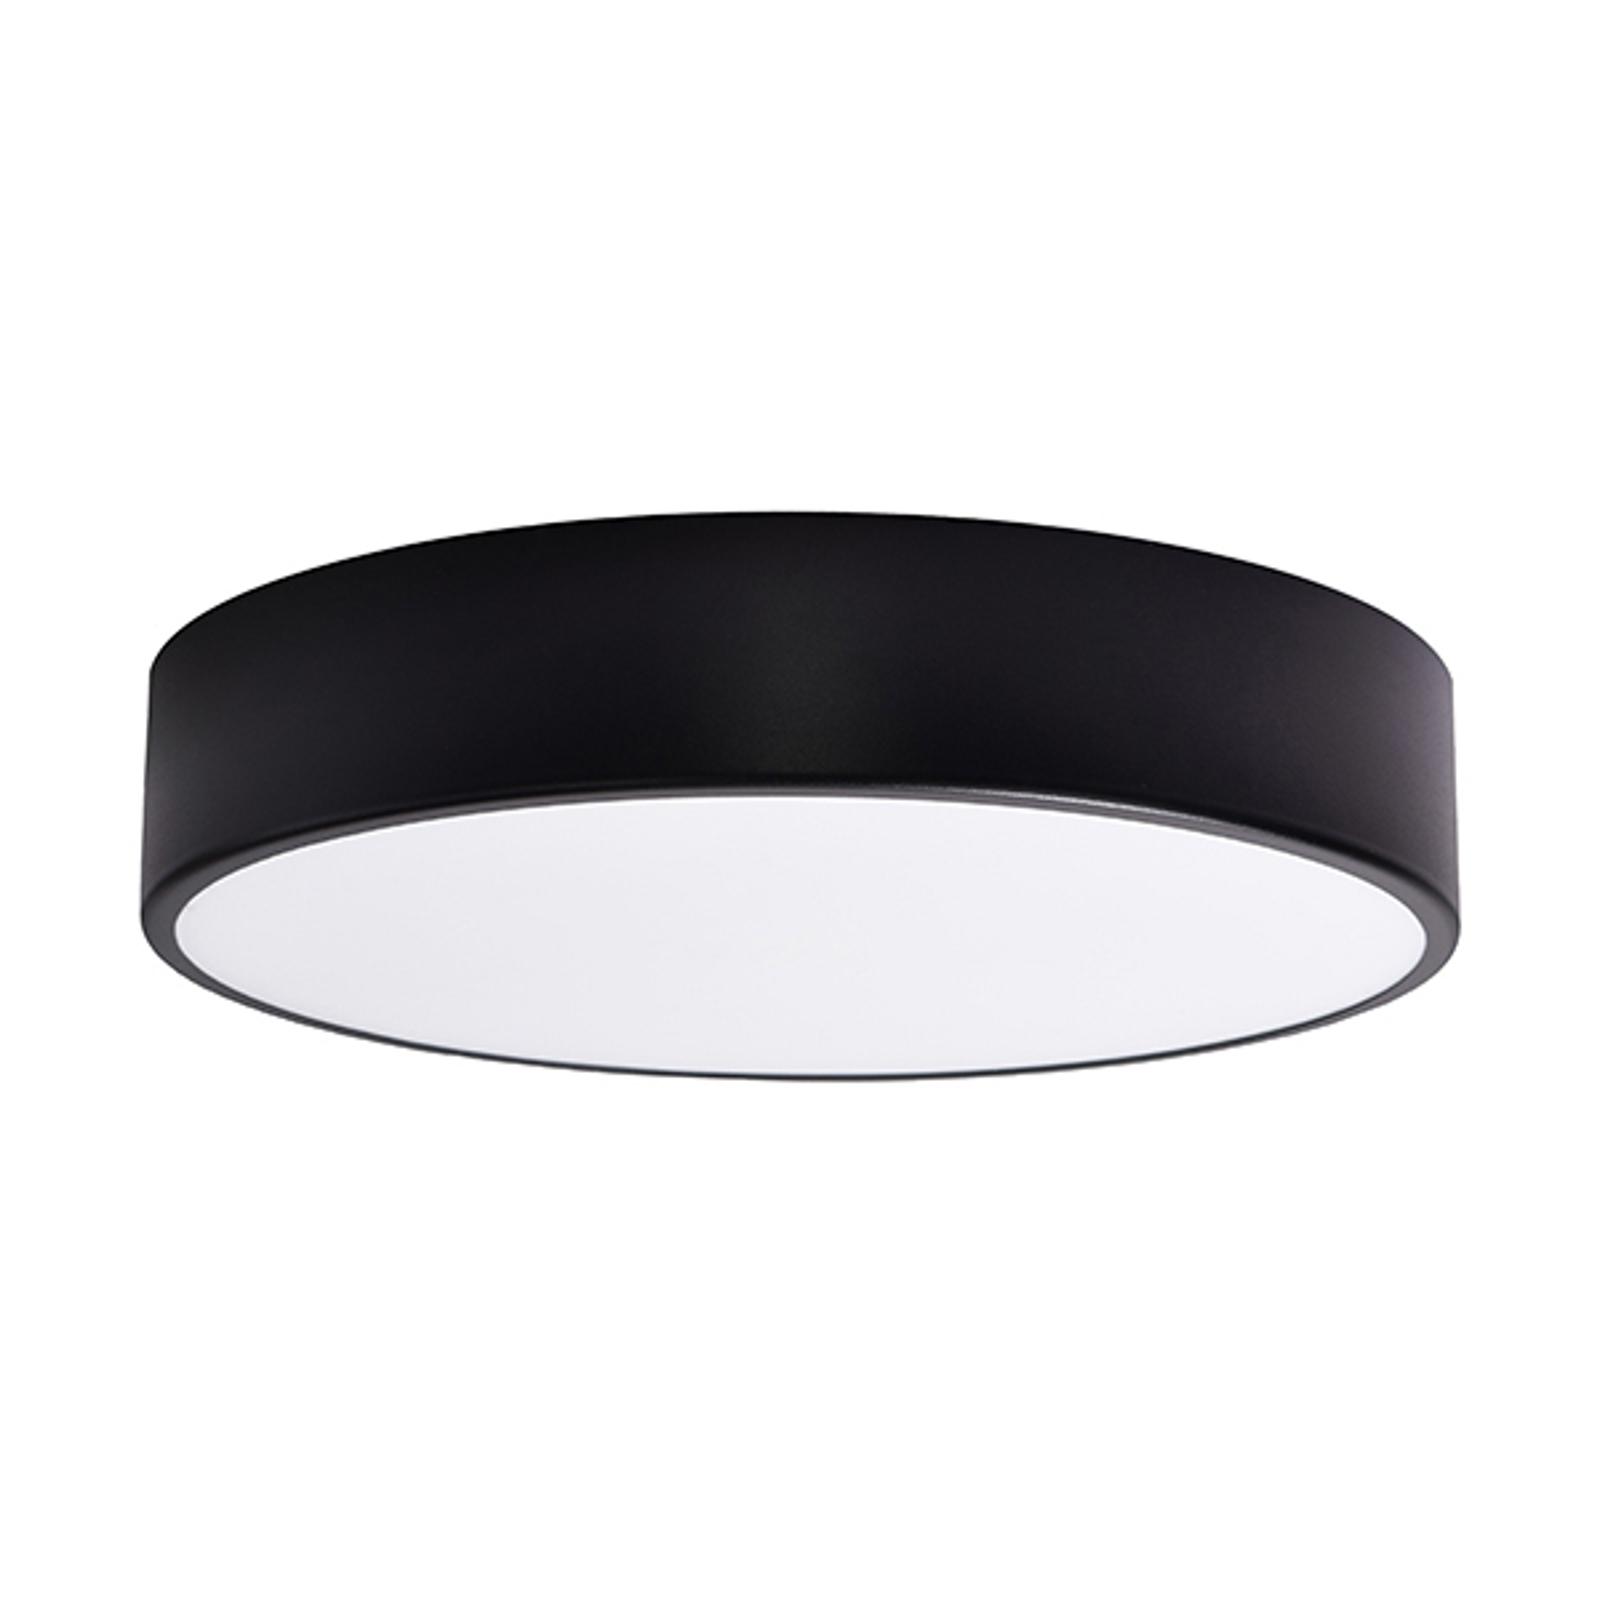 Taklampe Cleo, Ø 40 cm, svart